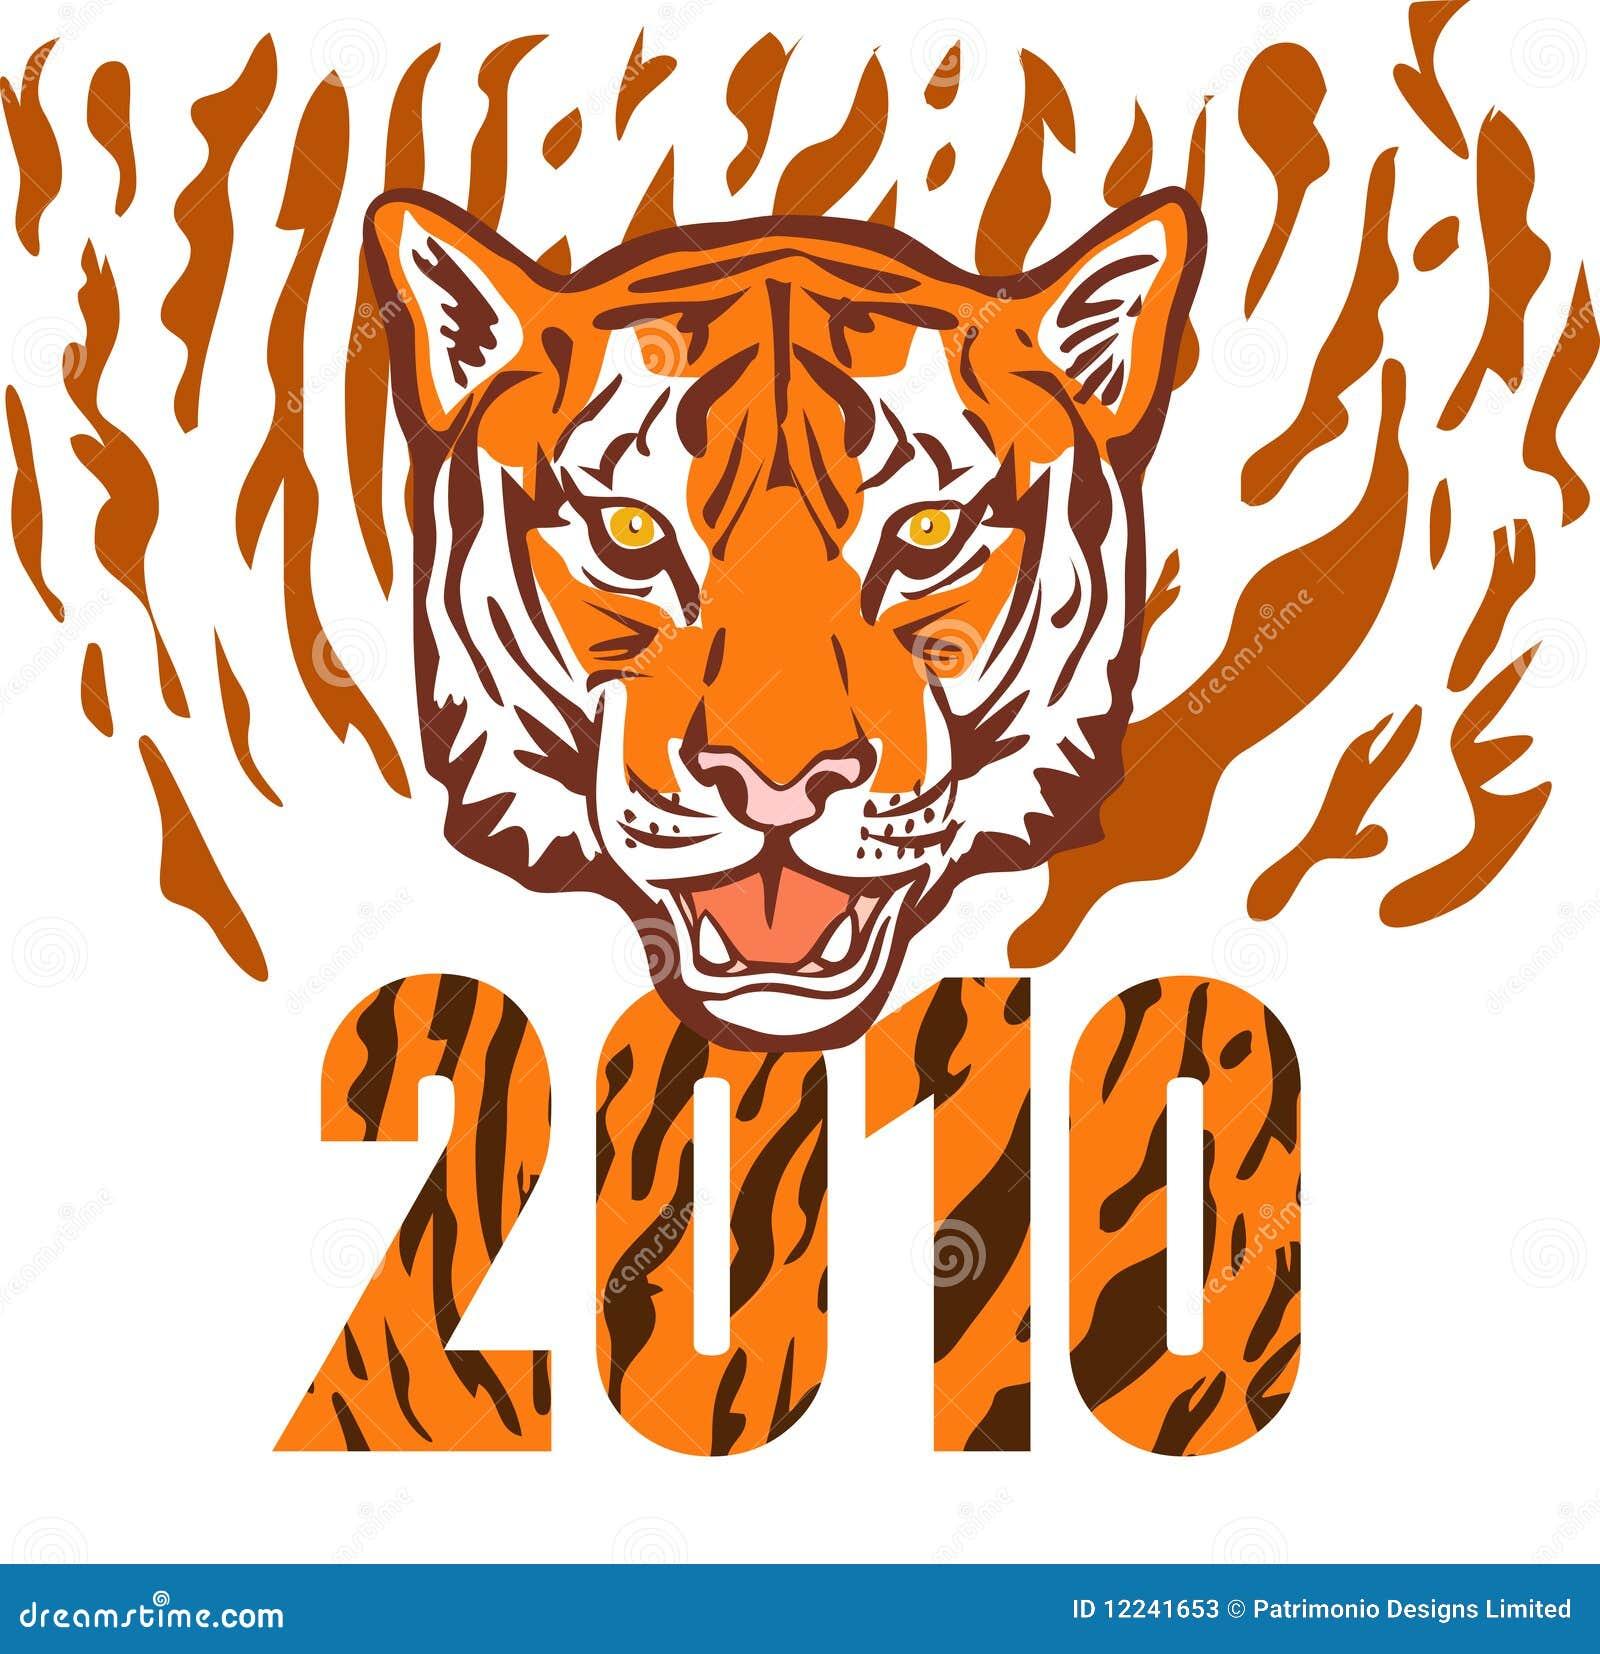 tiger photos roam wild on online dating sites